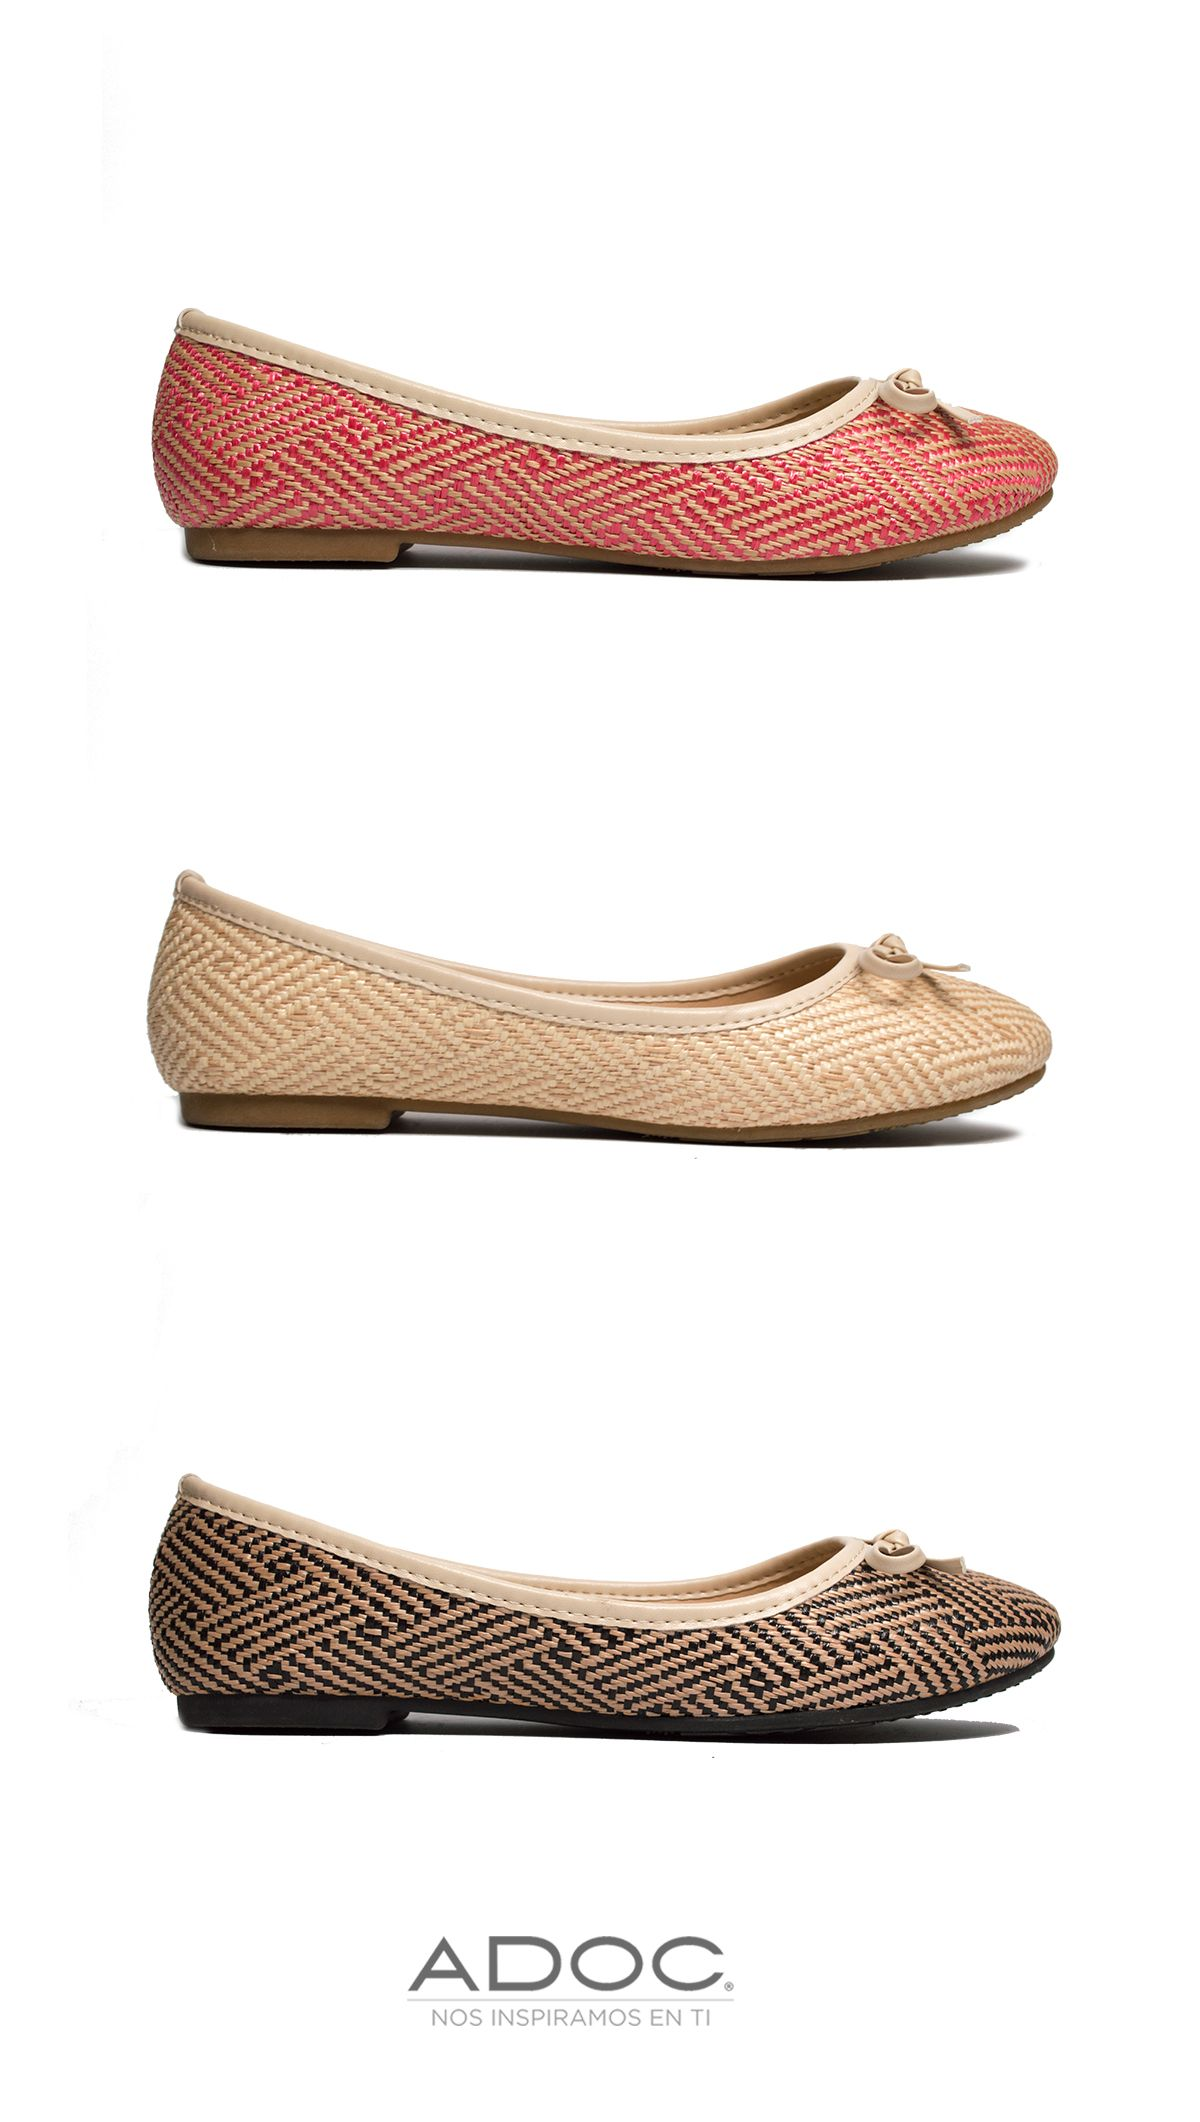 b49f189e9 Zapatos Grace de ADOC disponibles en color negro